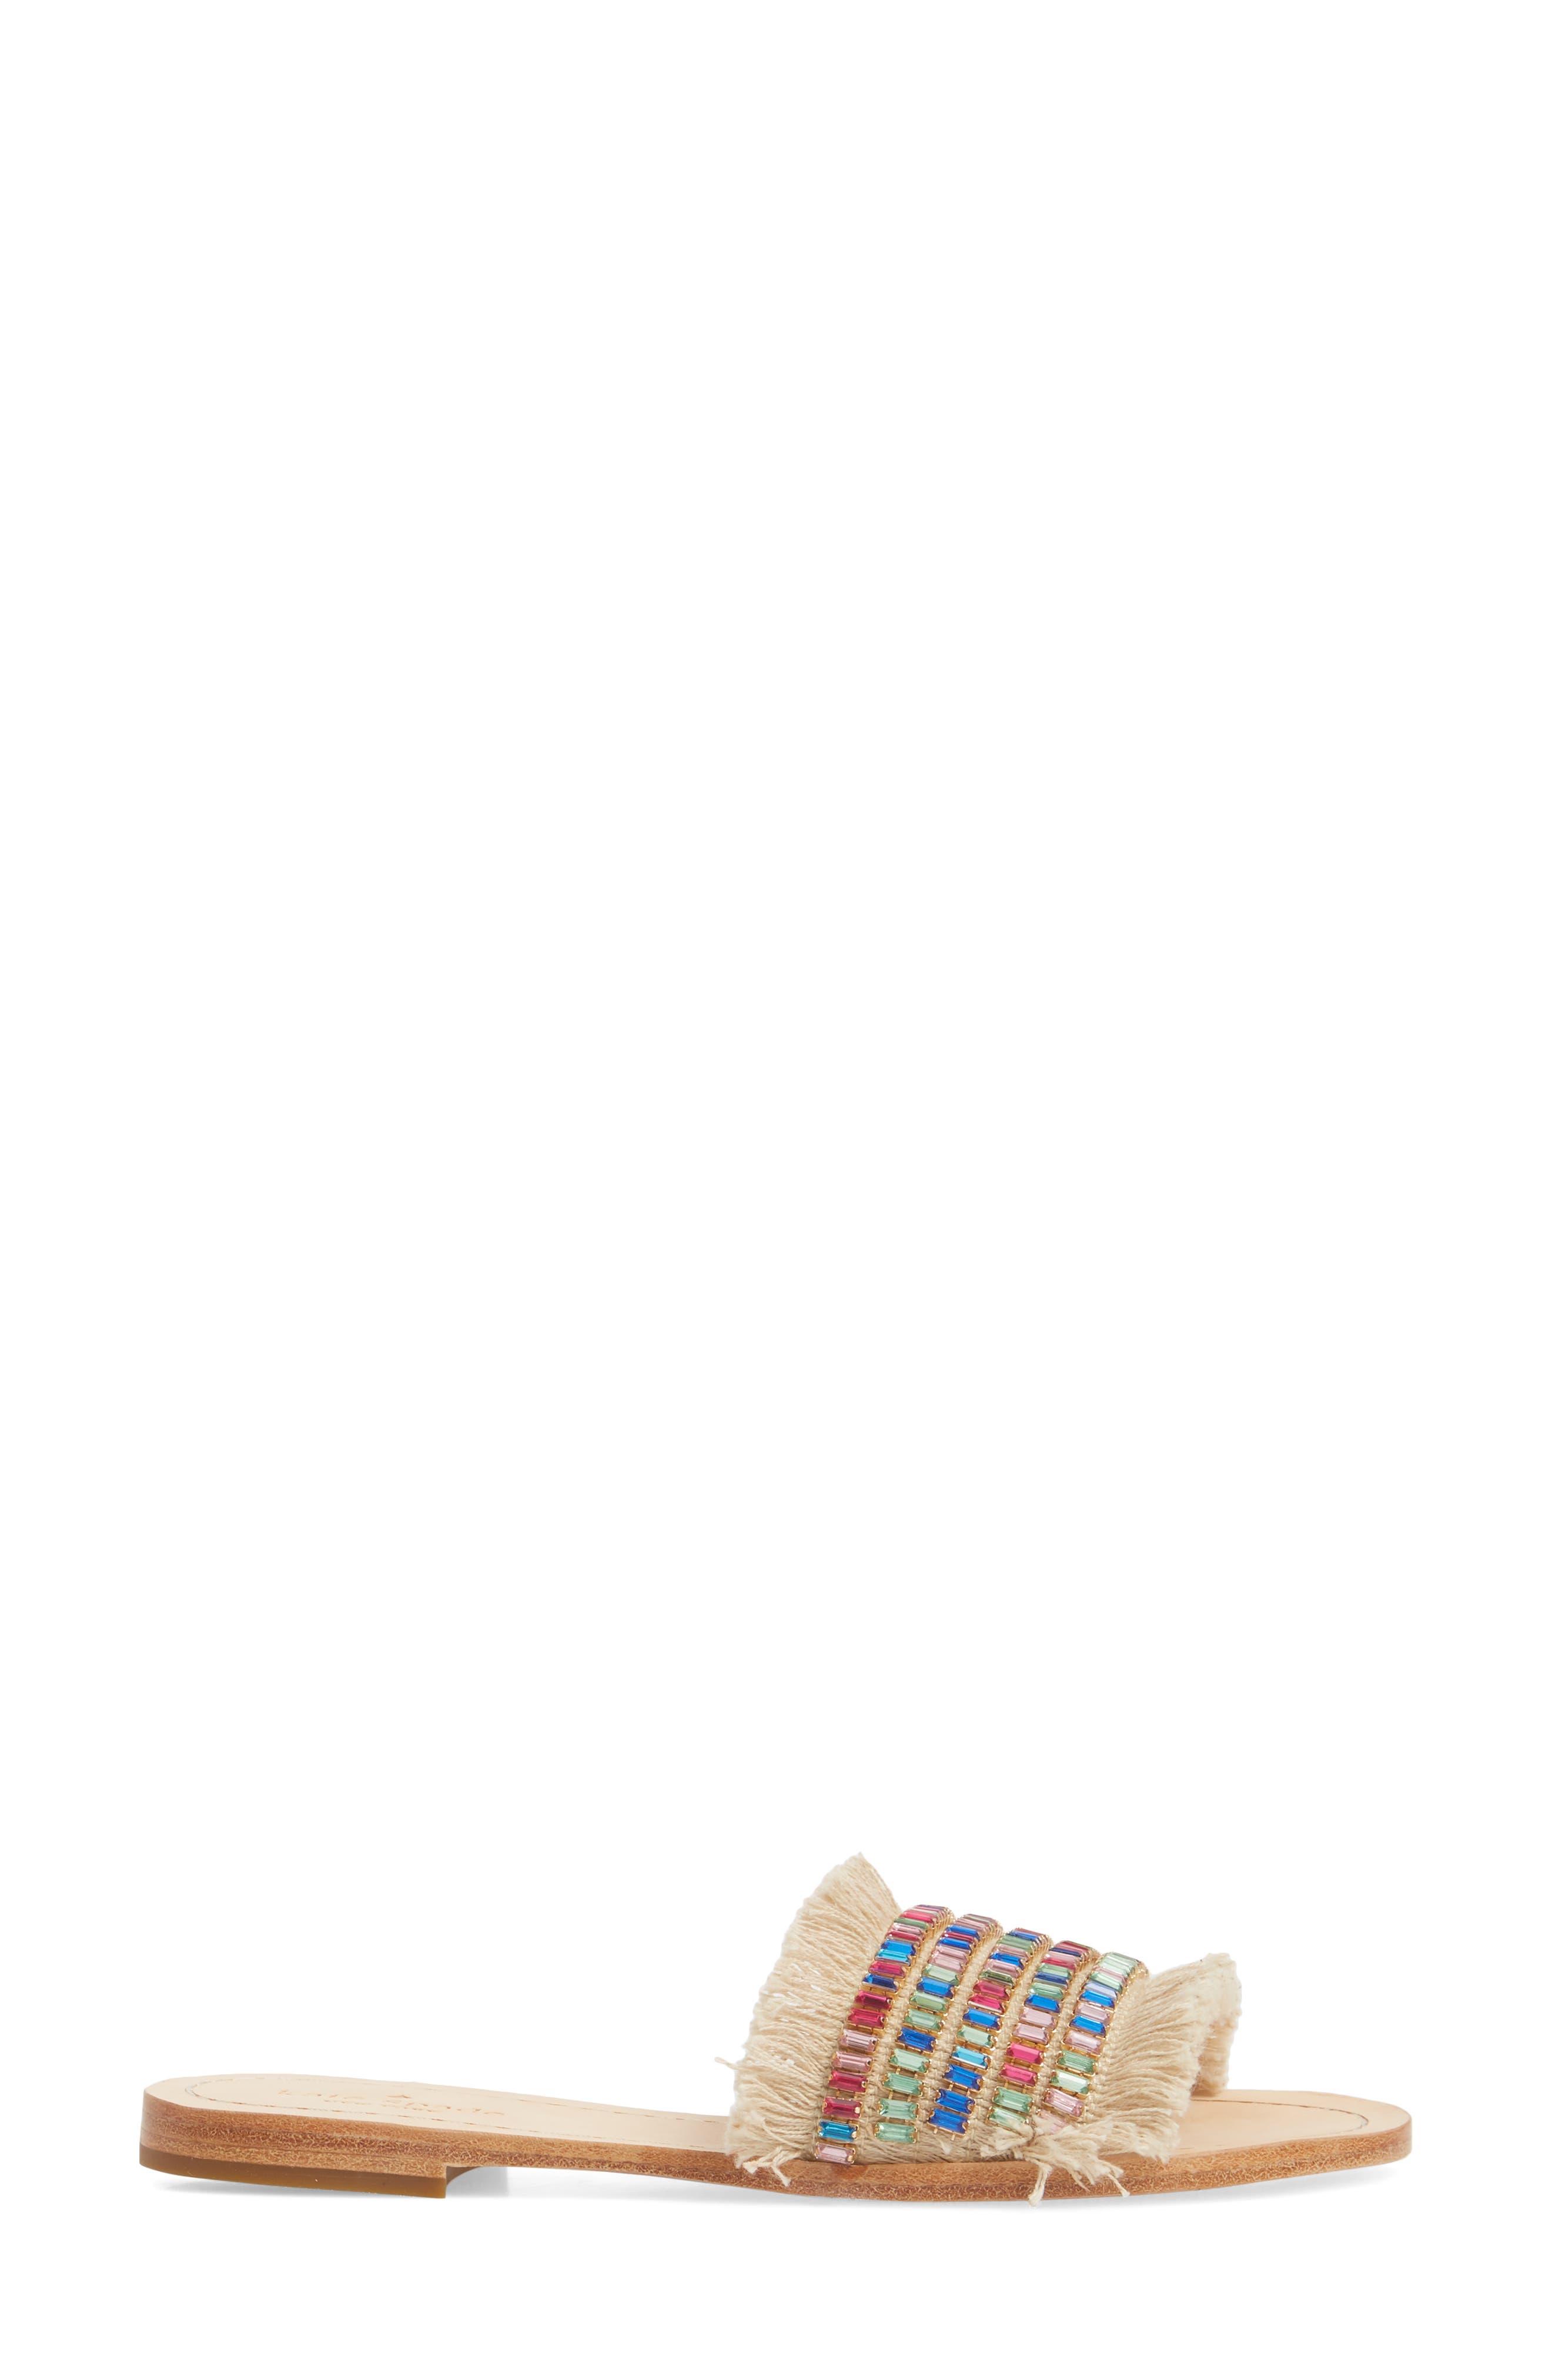 solaina slide sandal,                             Alternate thumbnail 3, color,                             Natural/ Multi